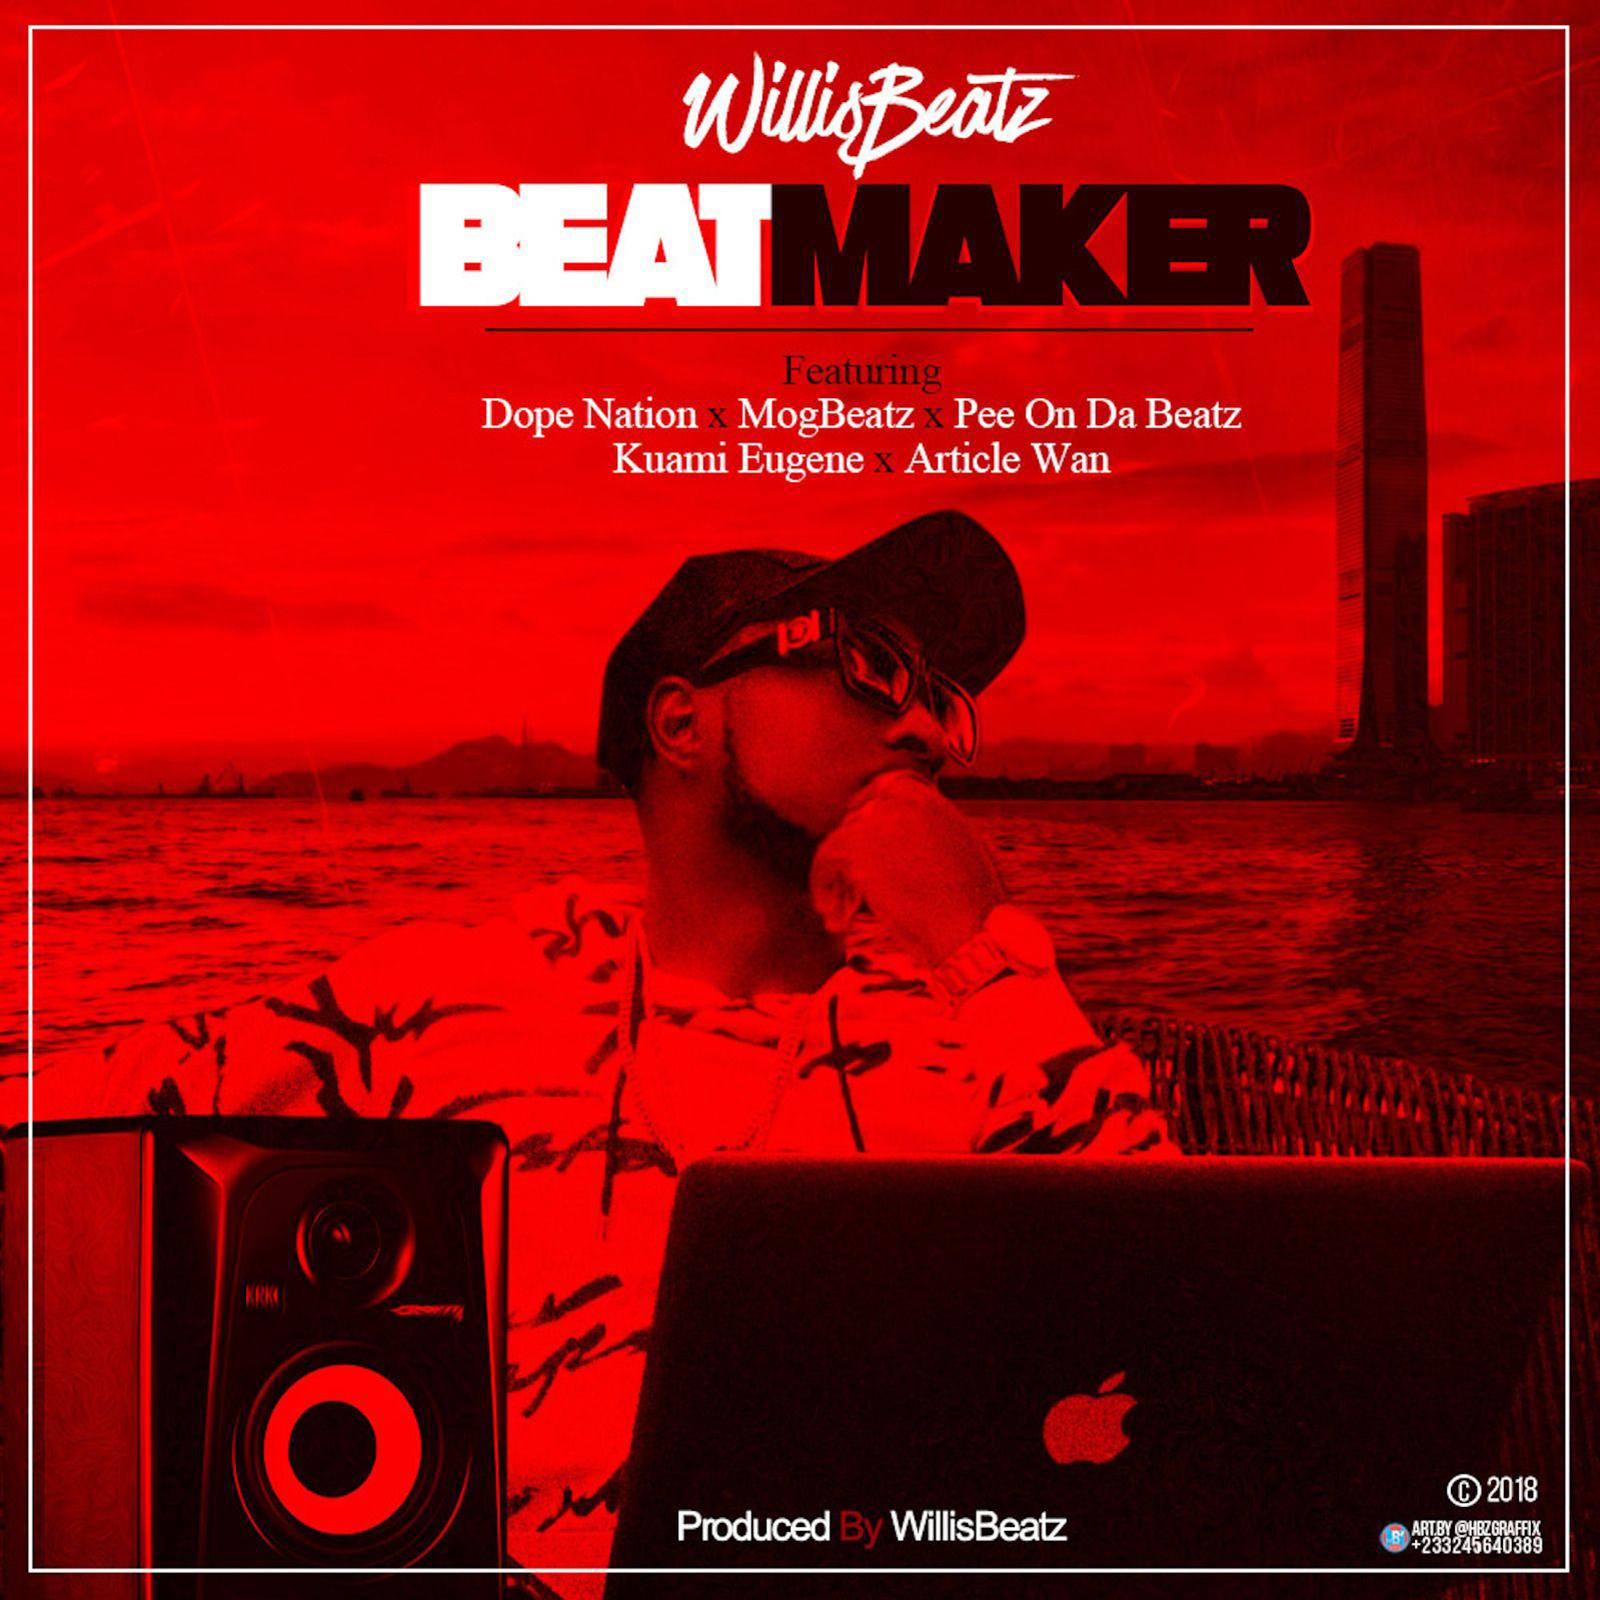 Beatmaker by WillisBeatz feat. Dopenation, MogBeatz, Pee On The Beatz, Kuami Eugene & Article Wan